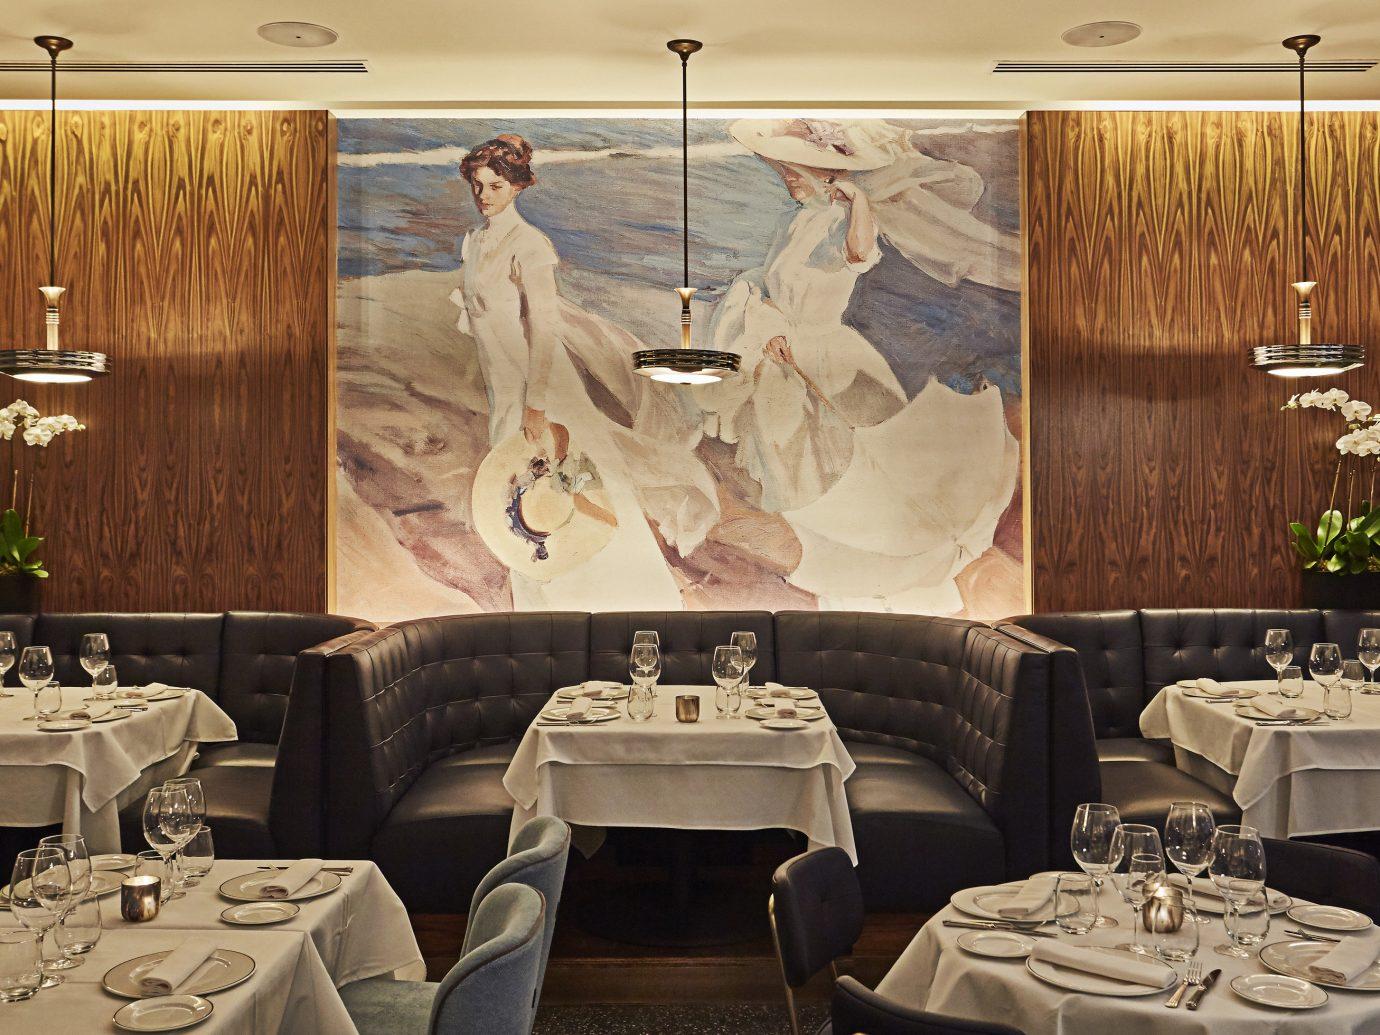 Trip Ideas room interior design ceremony wedding restaurant meal table